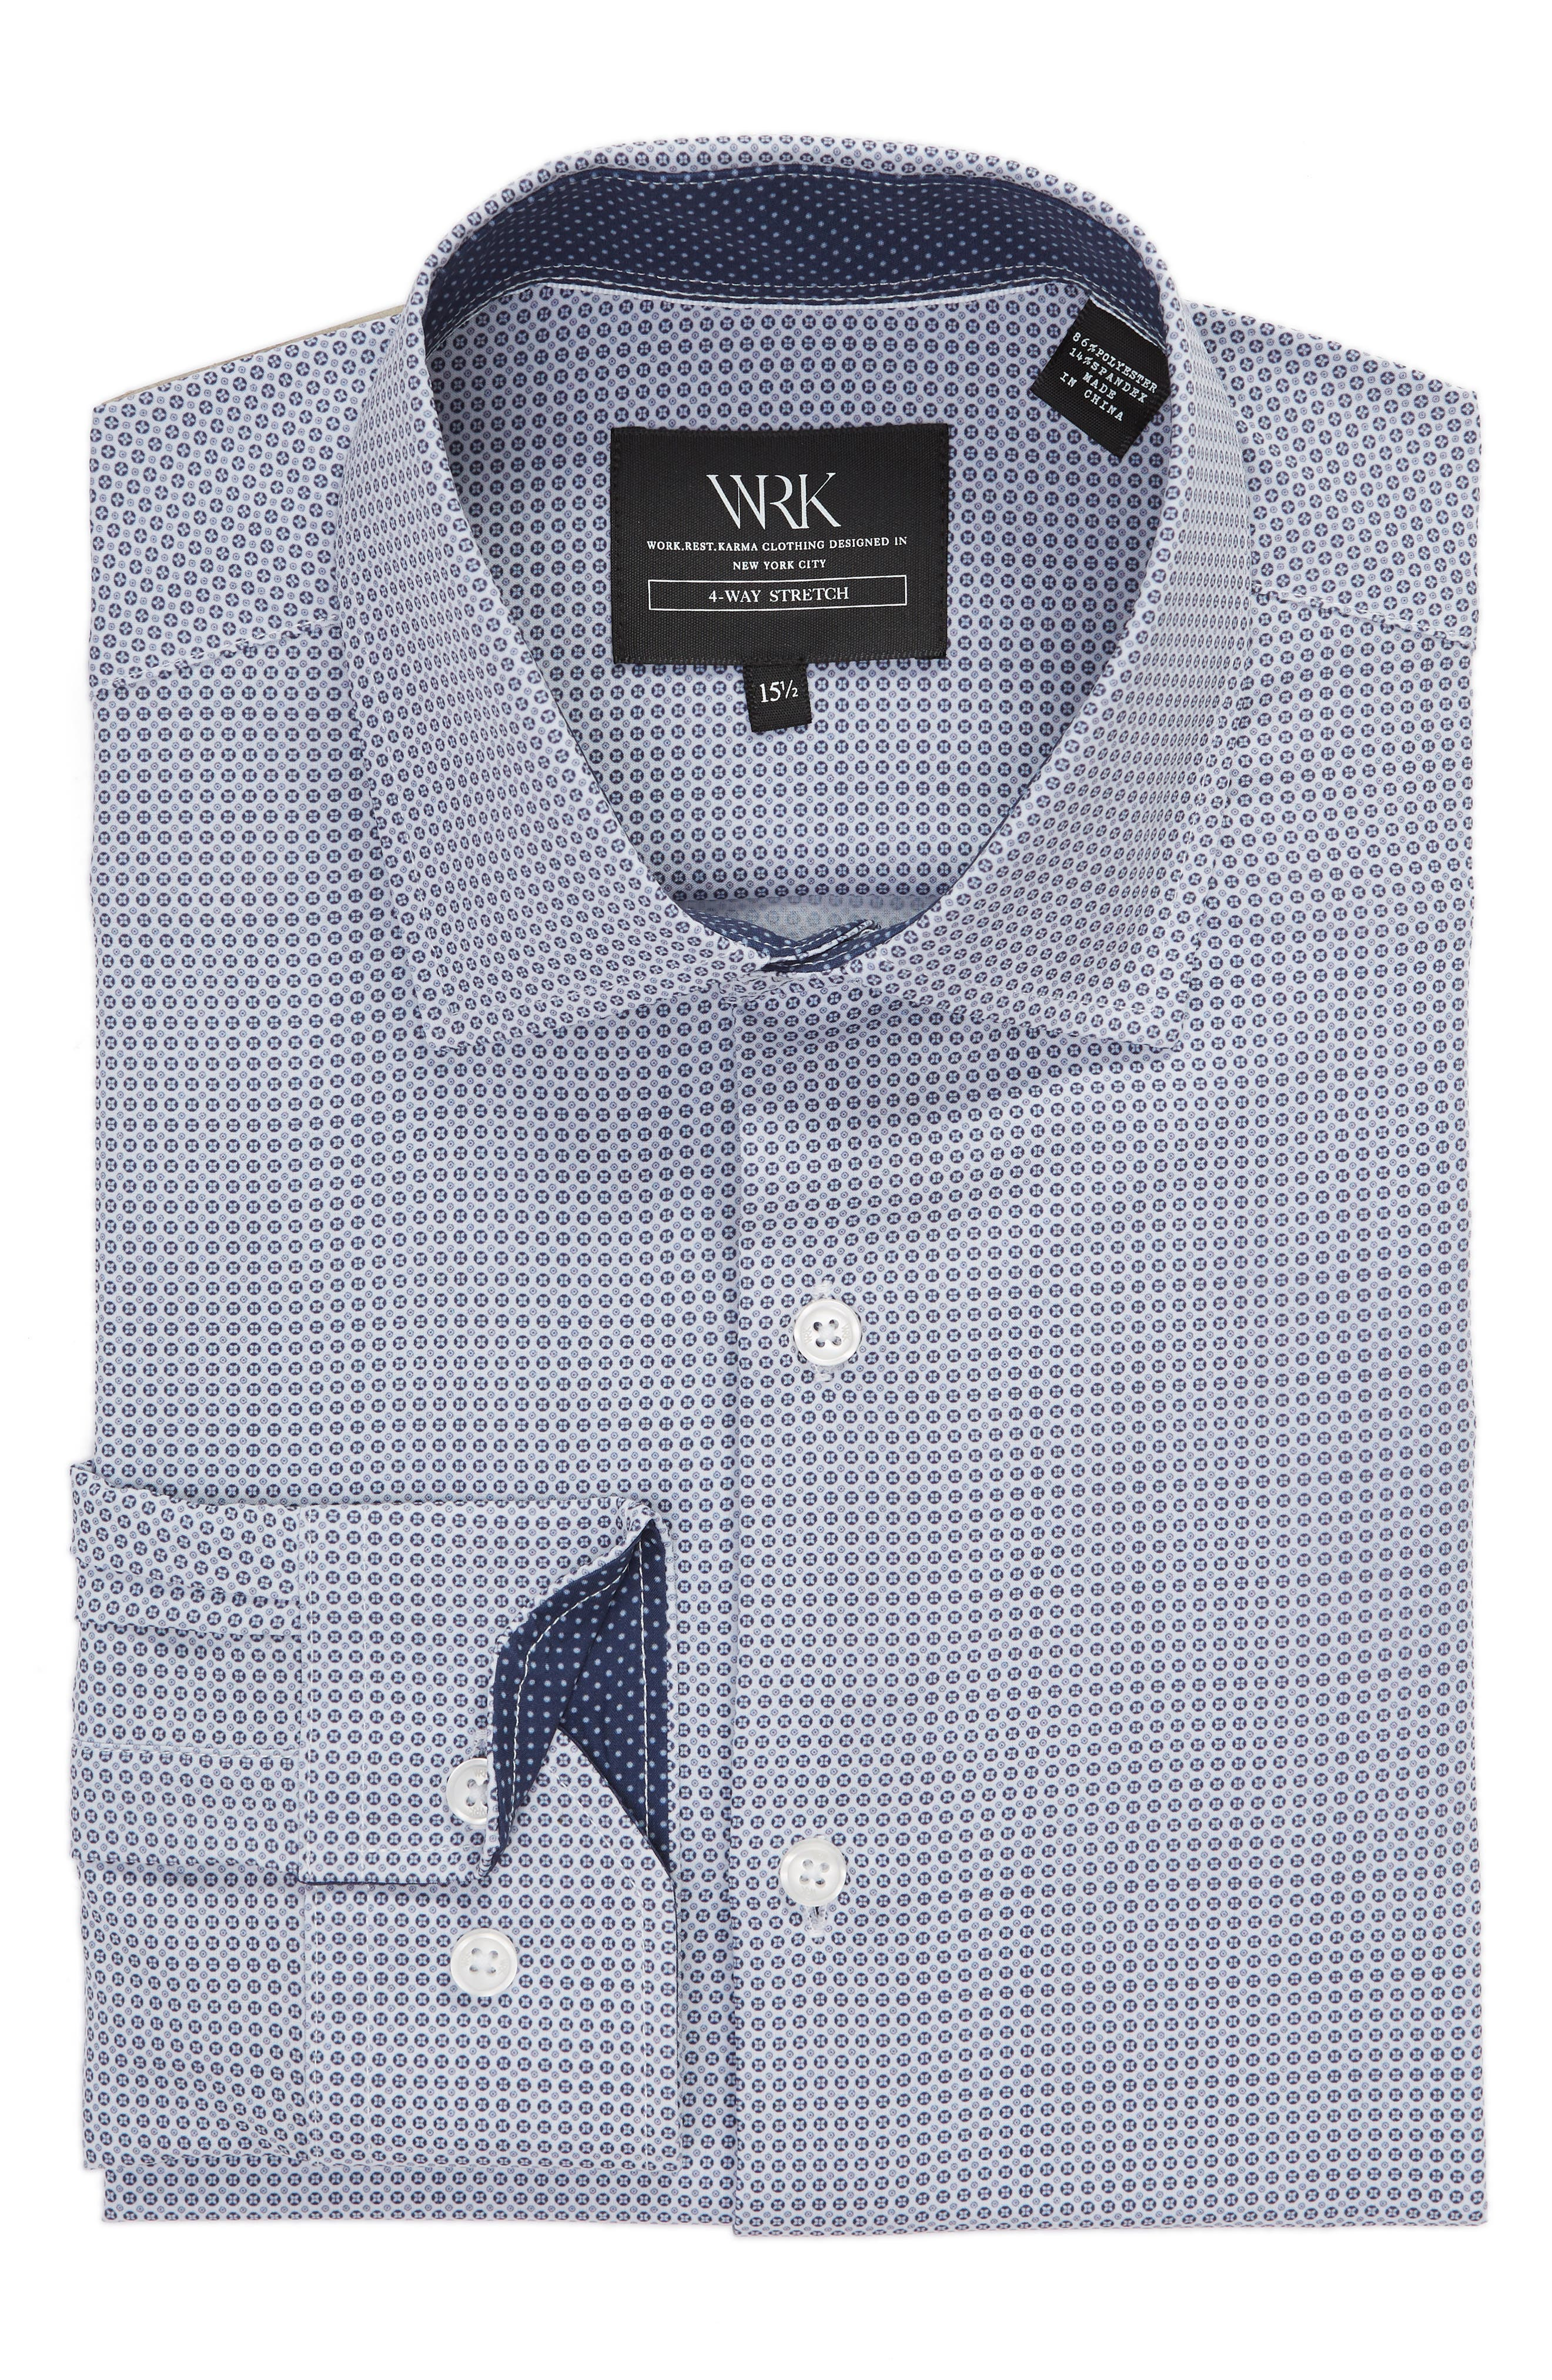 Trim Fit 4-Way Stretch Geometric Dress Shirt,                             Alternate thumbnail 5, color,                             400